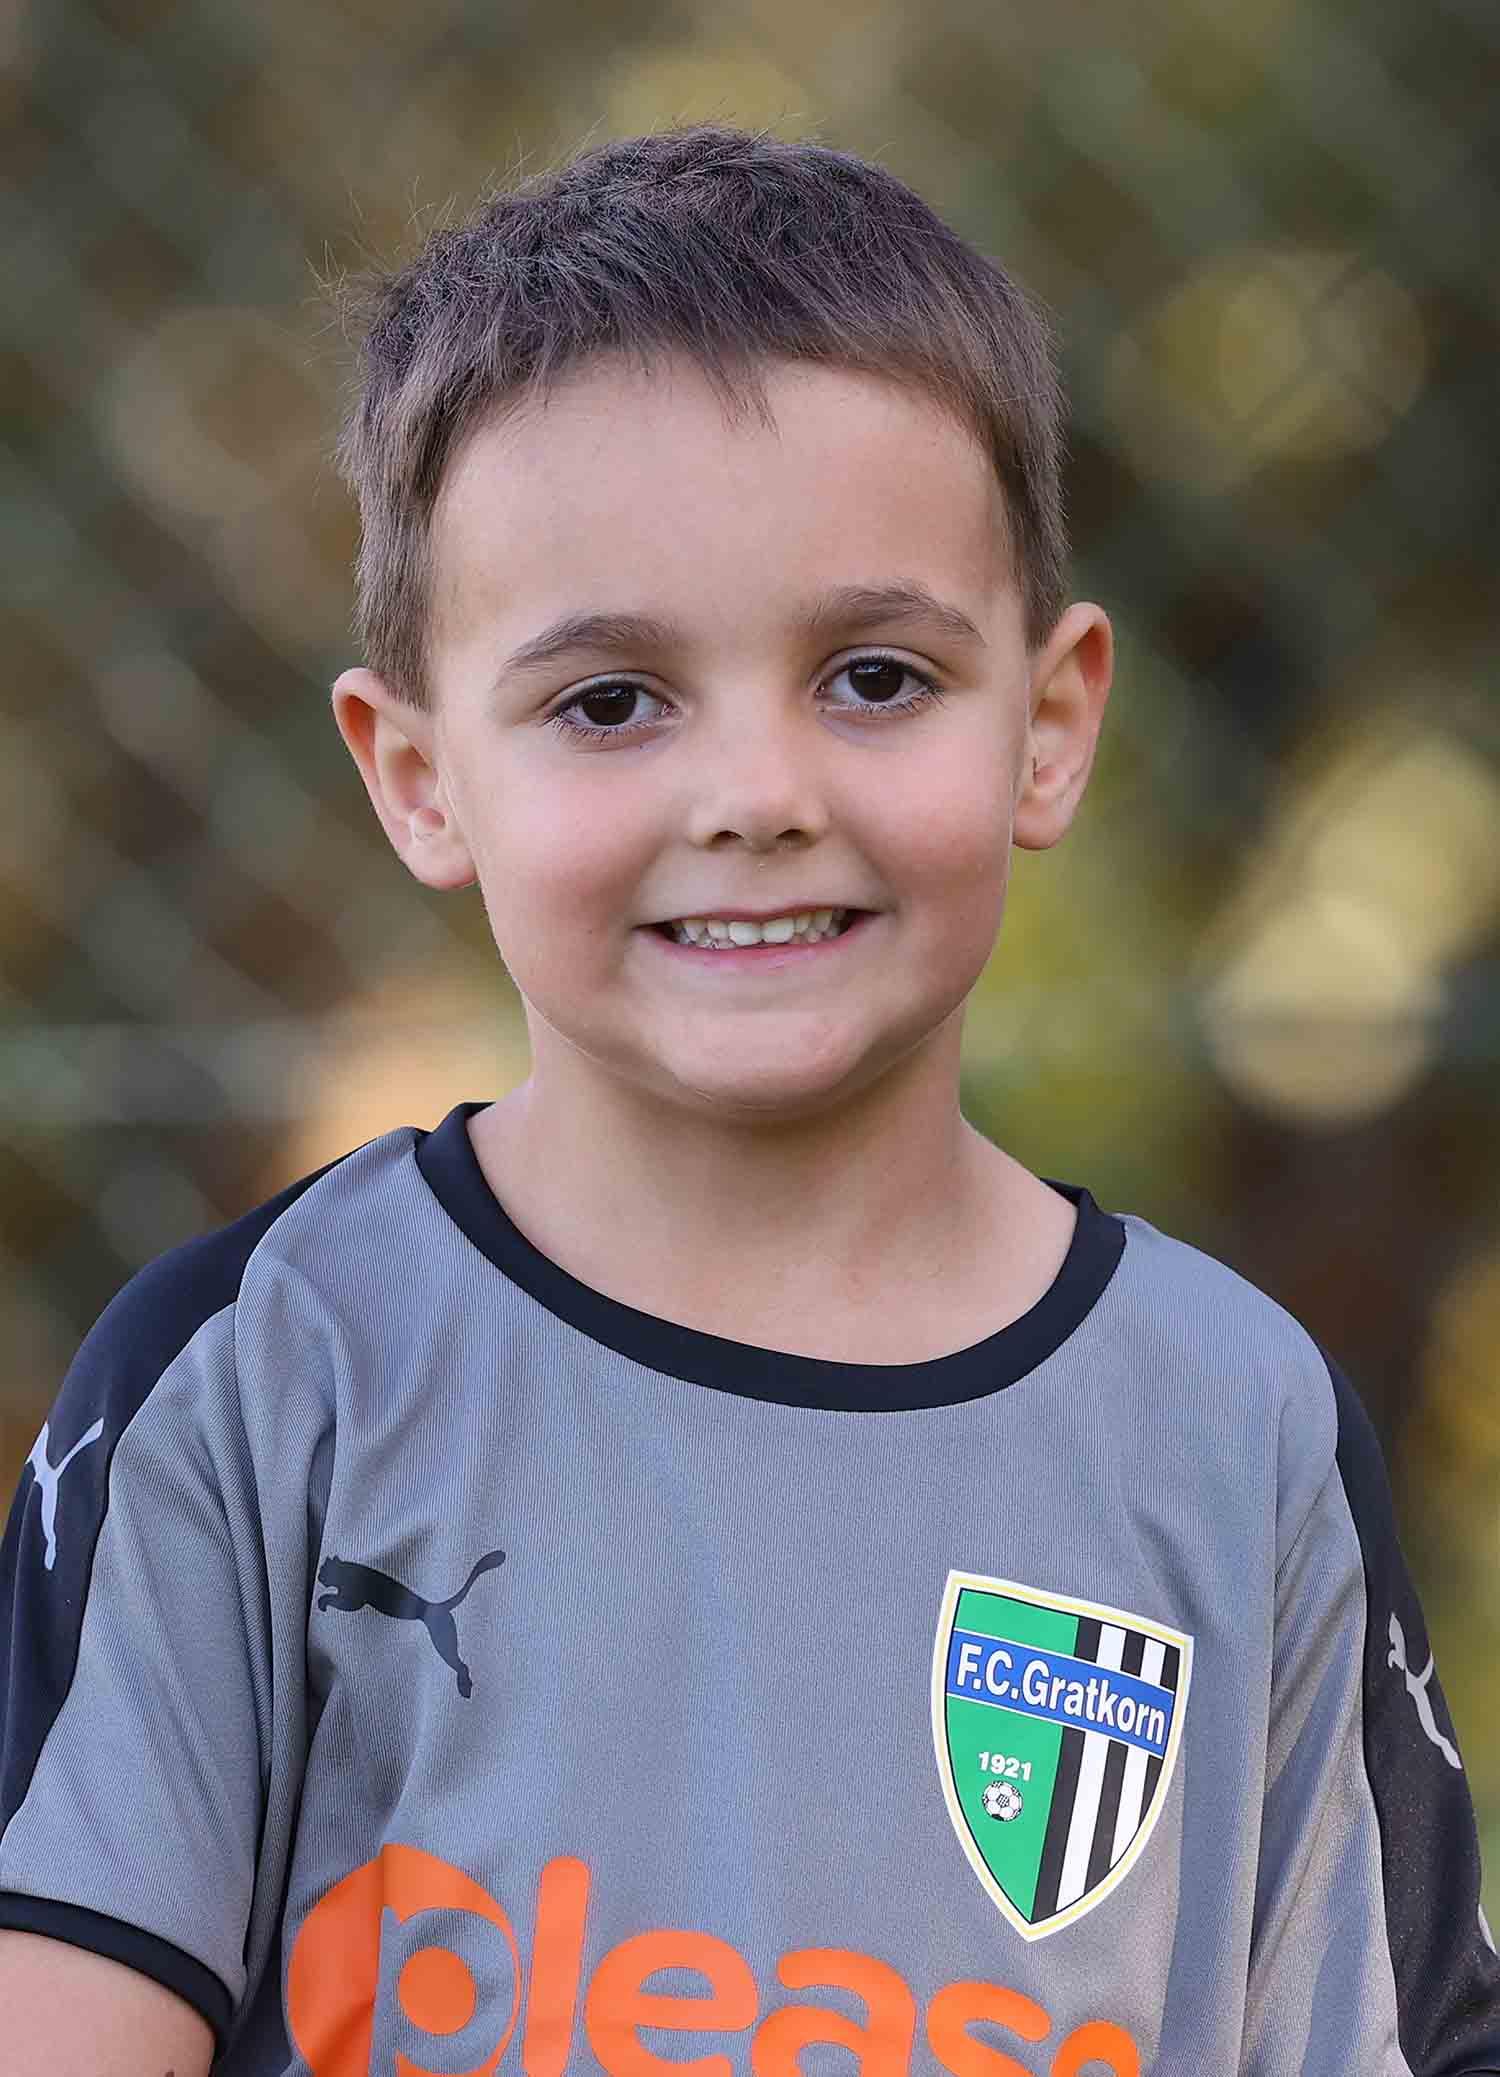 Leon Mohr, FC Gratkorn U8